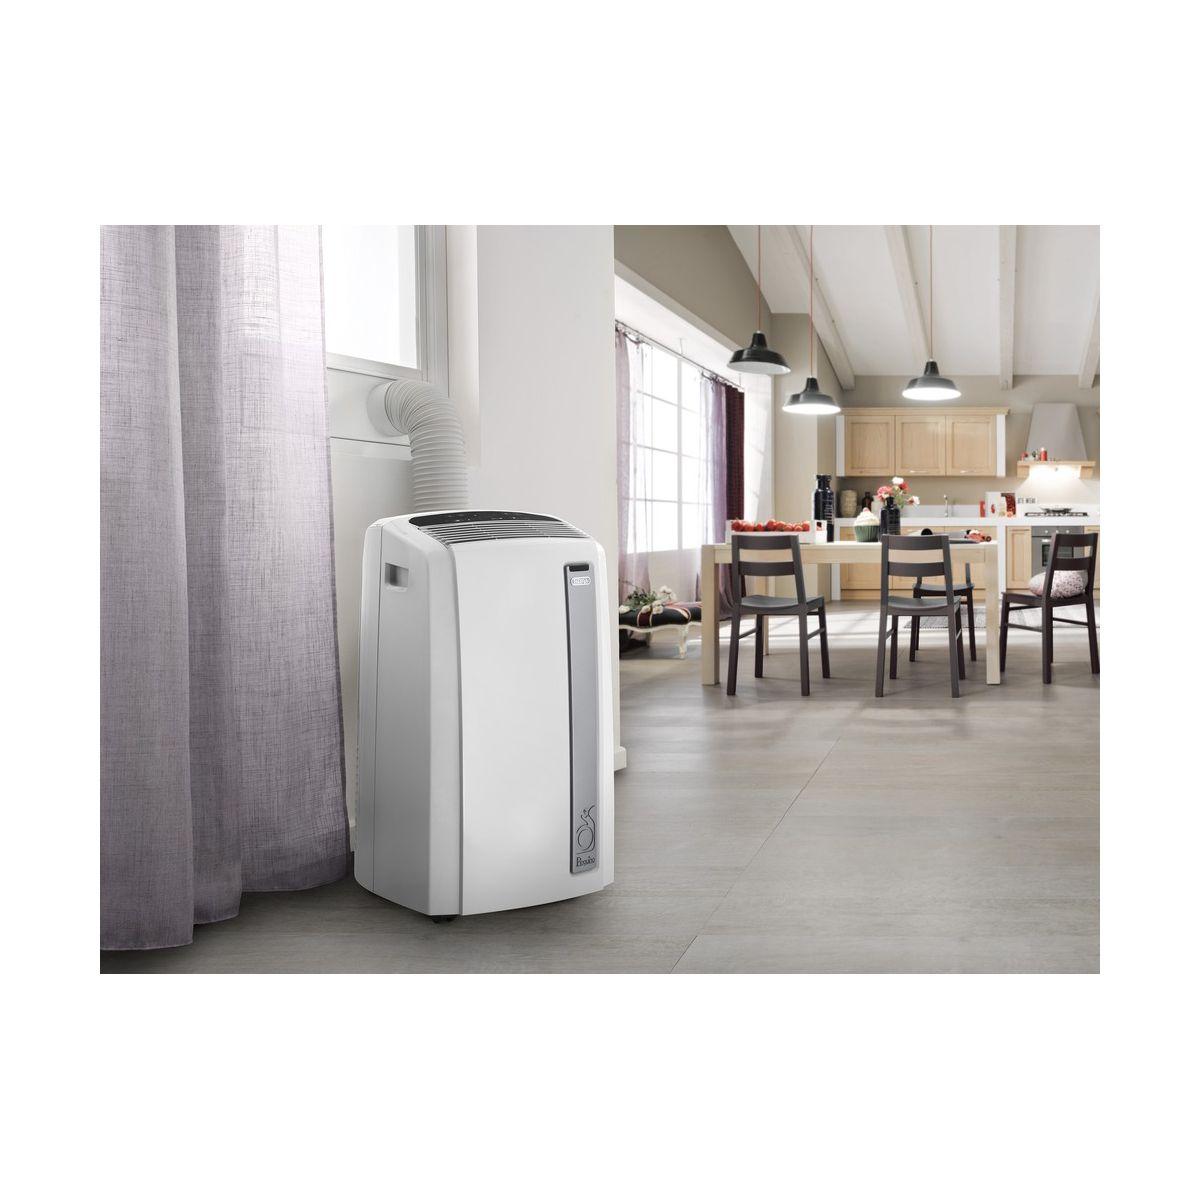 delonghi pac an112 silent climatiseur monobloc mobile. Black Bedroom Furniture Sets. Home Design Ideas